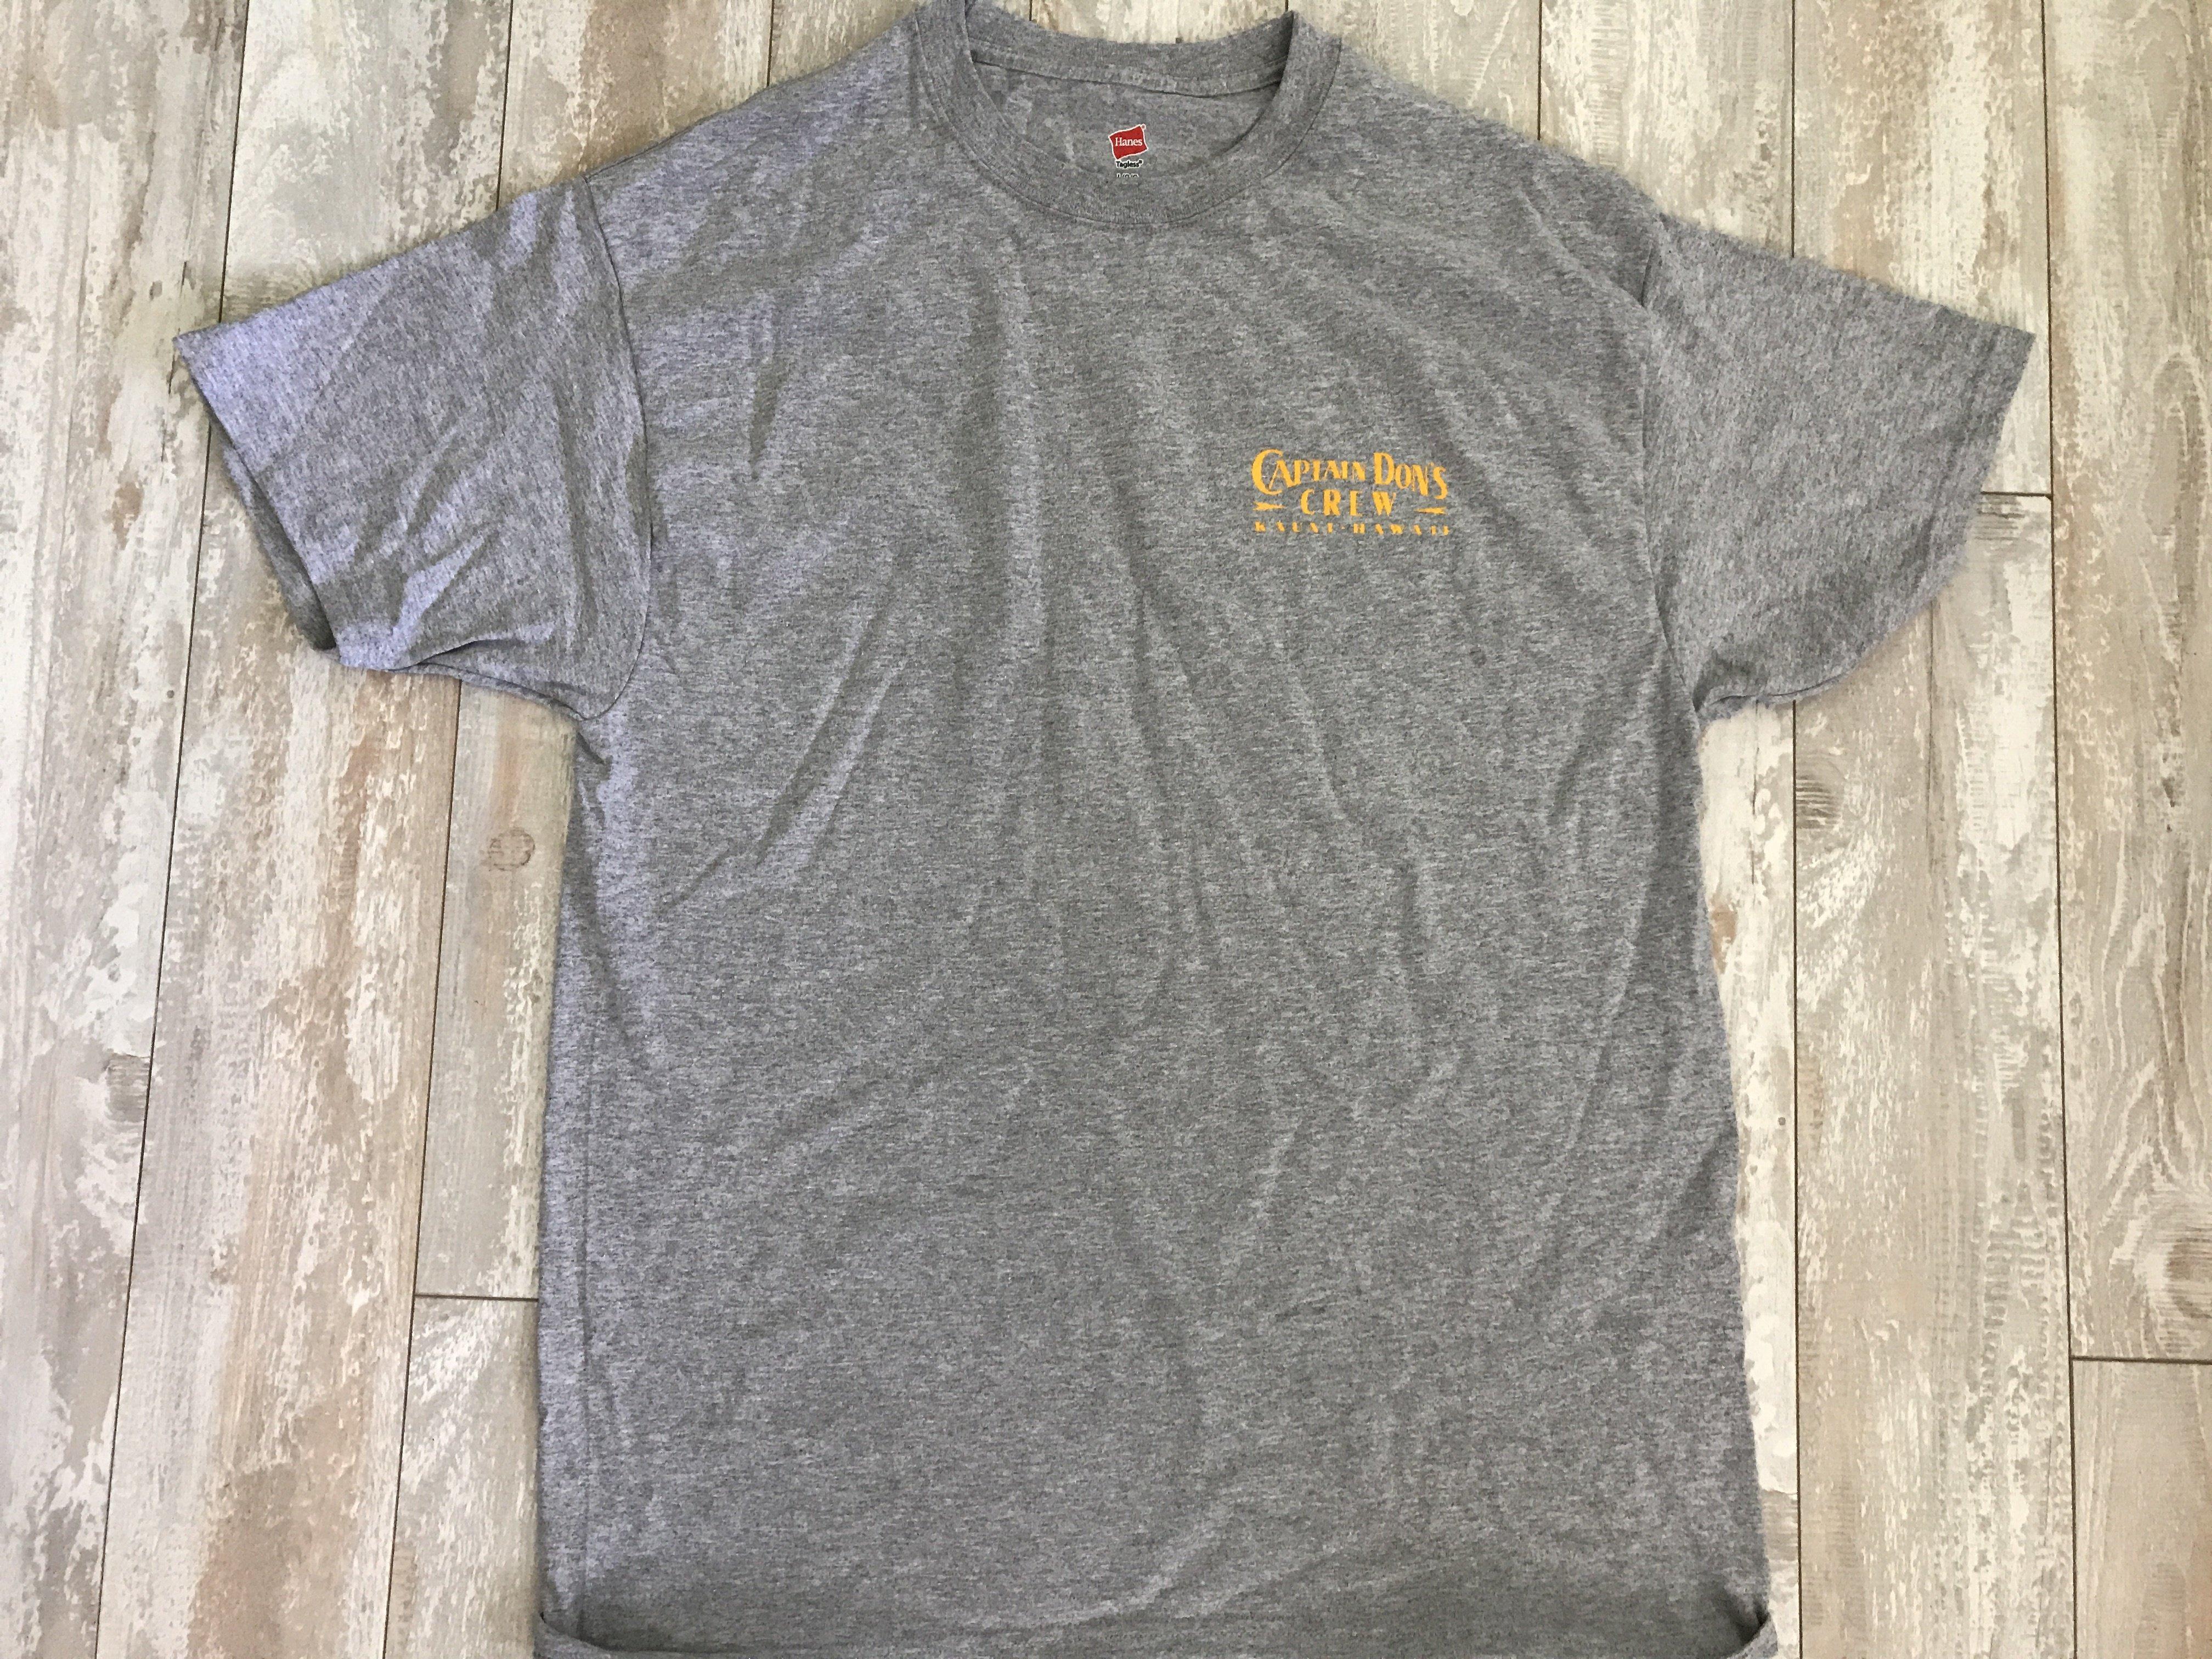 Captain Don's Sportfishing T-Shirt Grey 00001